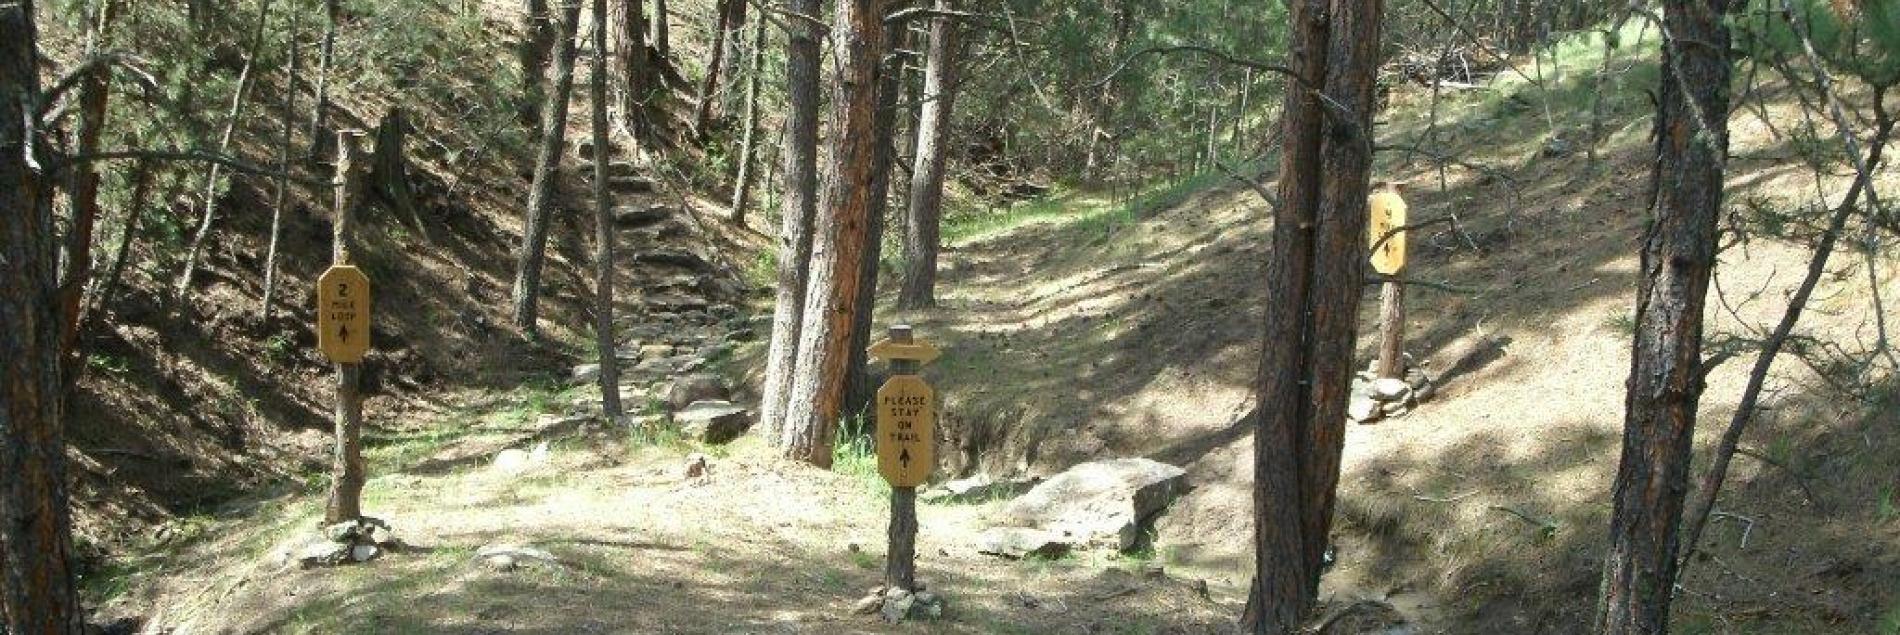 Serenity Trail